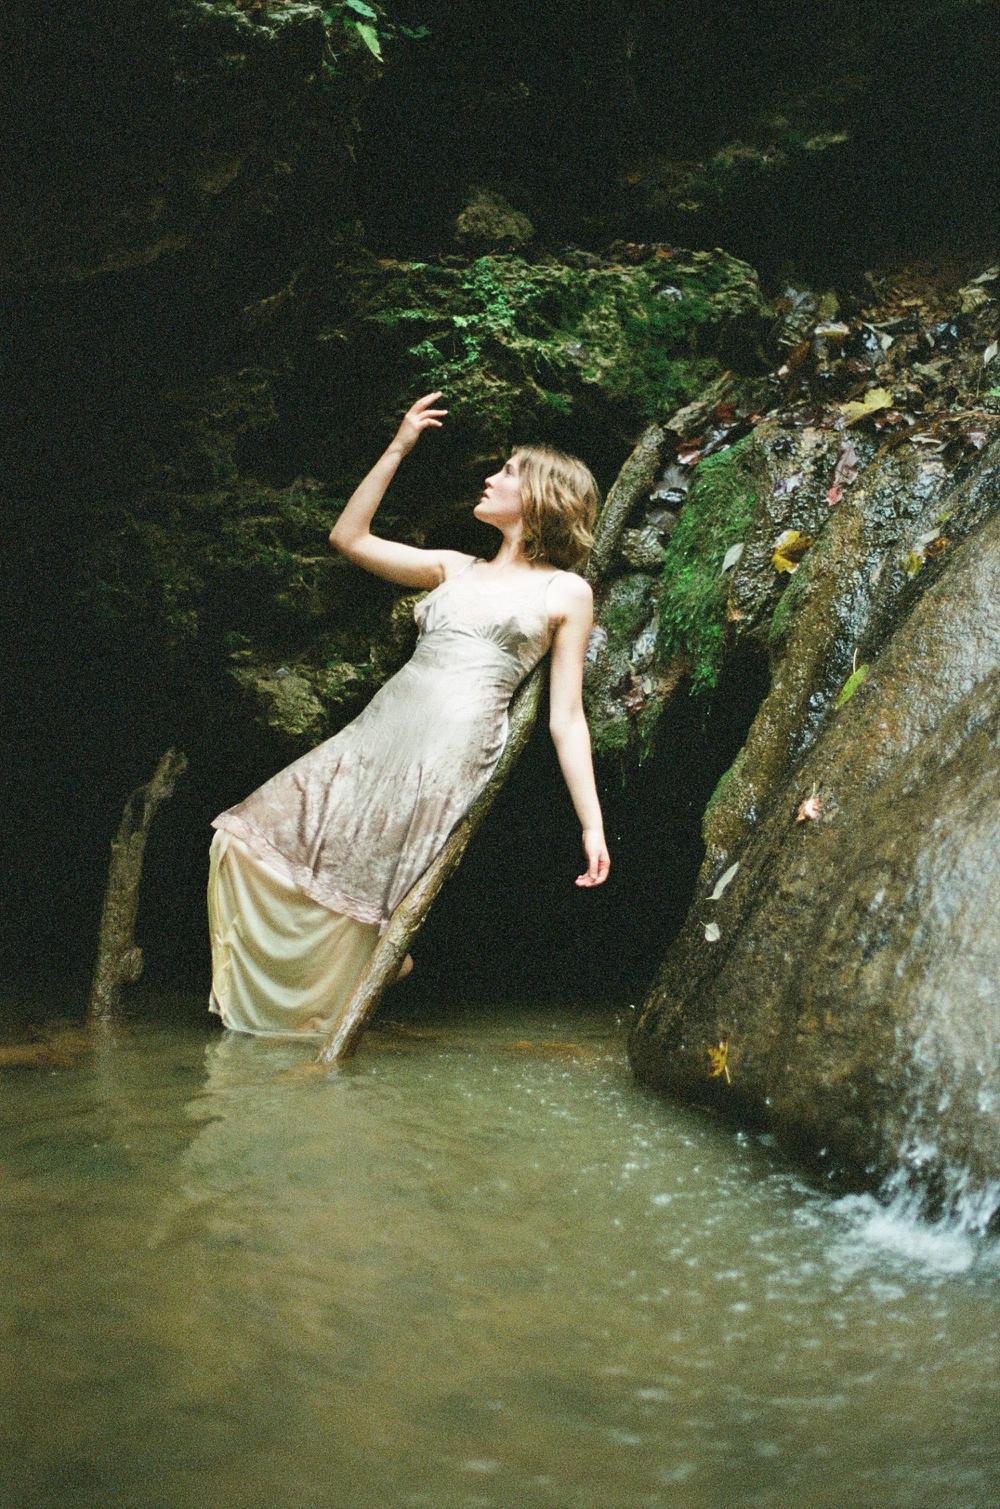 creative-film-photography-mermaidens-portrait-series-by-holly-cromer-02.jpg